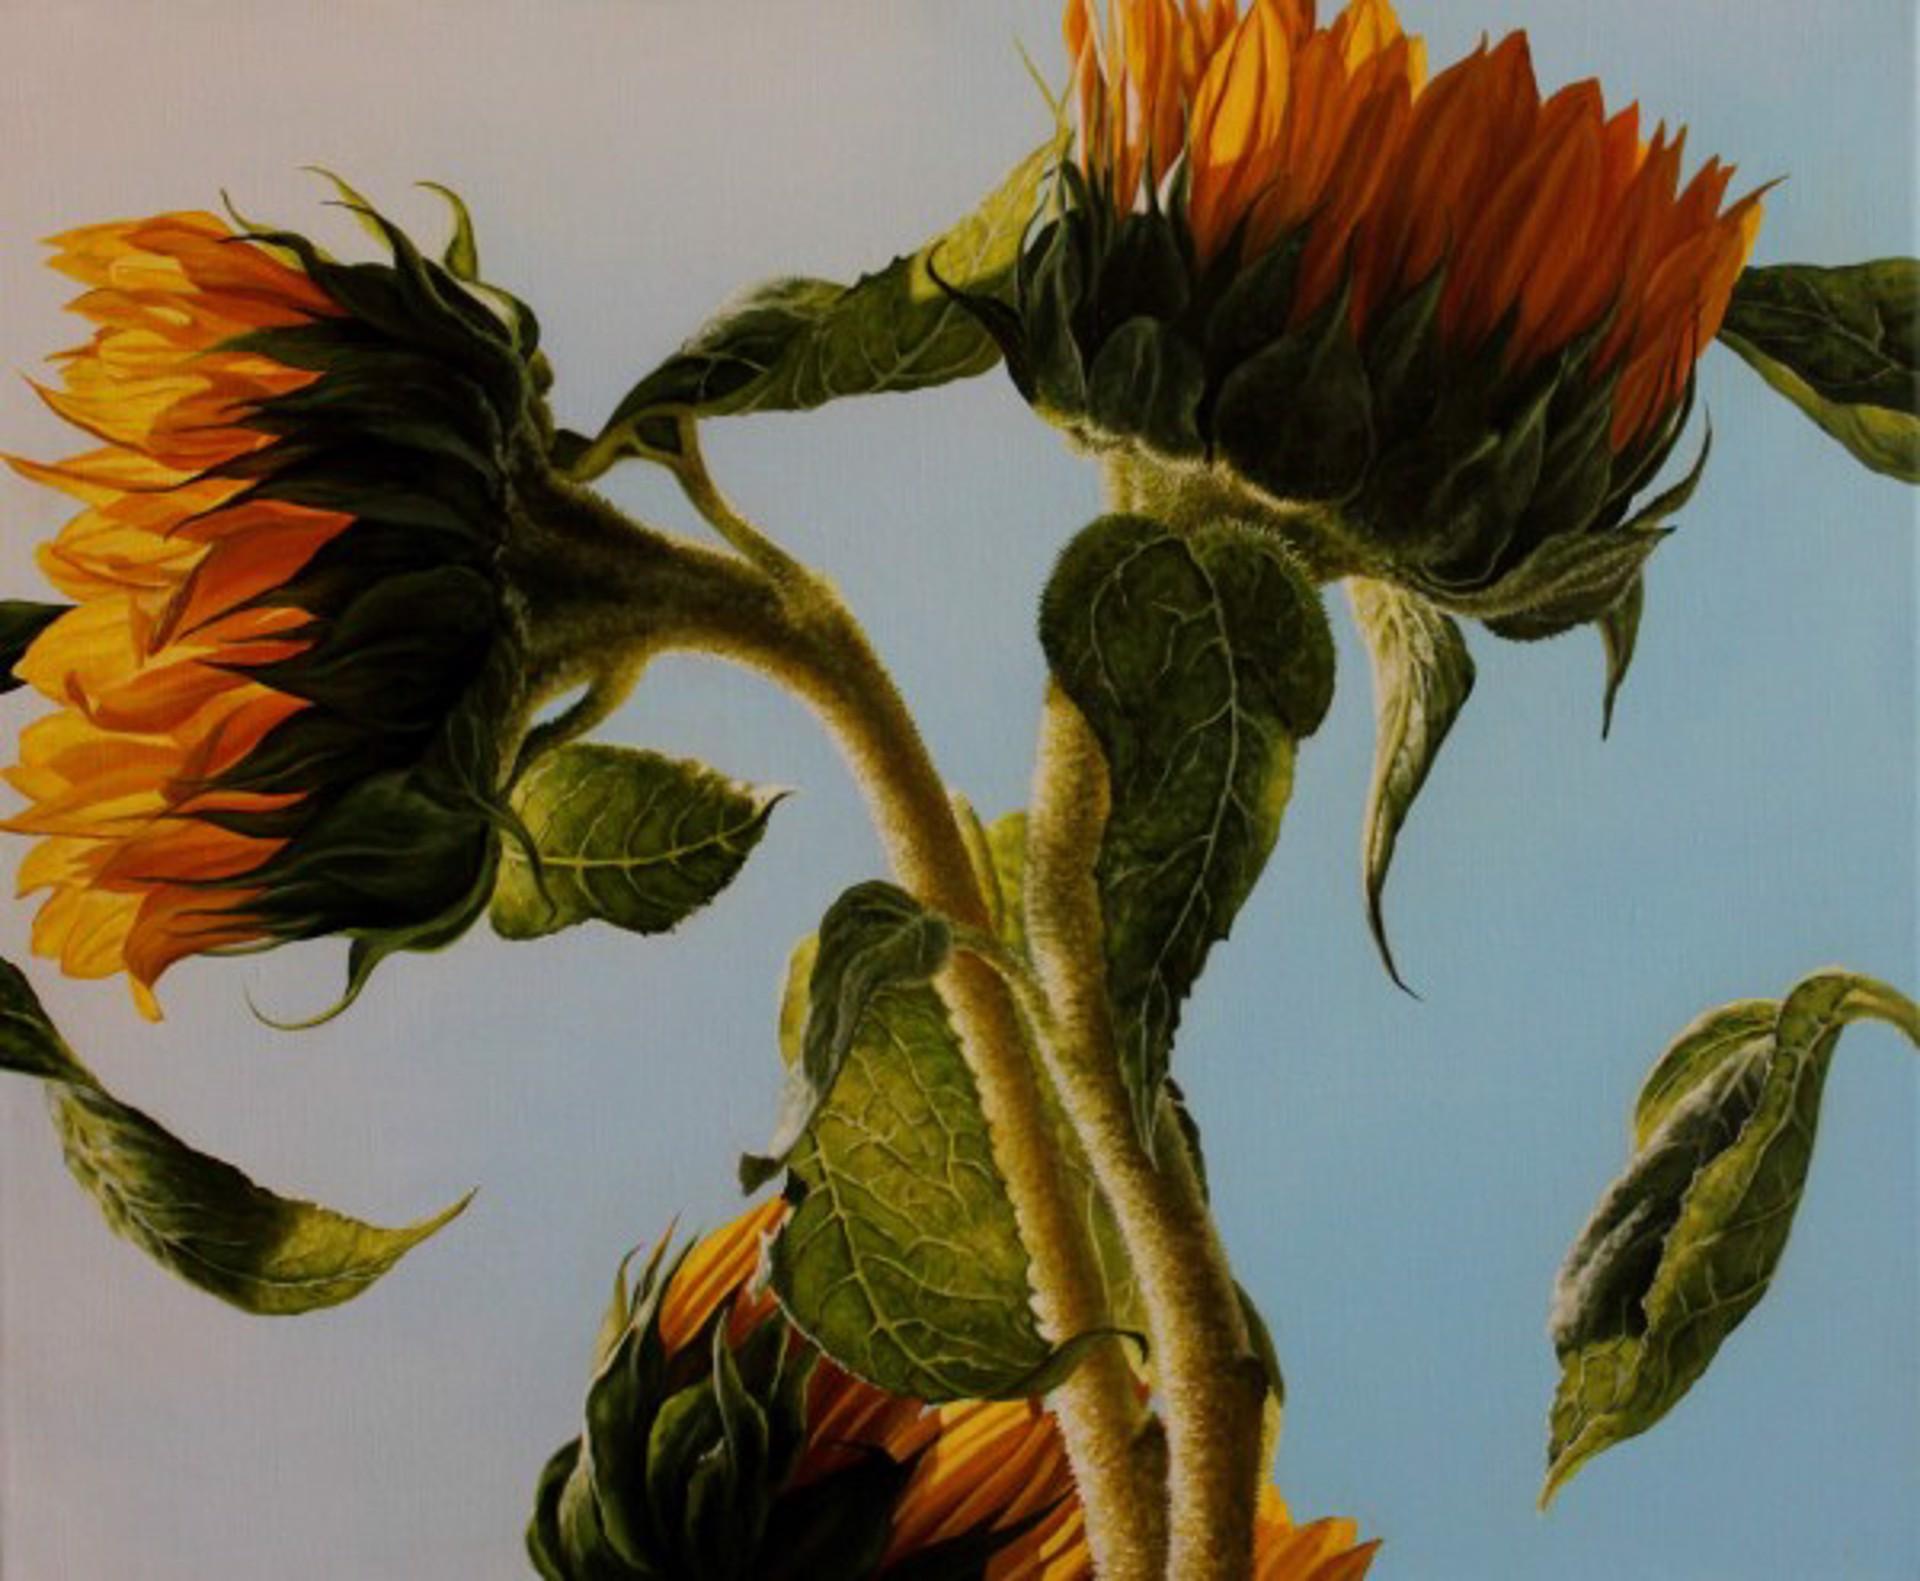 Reaching for the Sun by Loren DiBenedetto